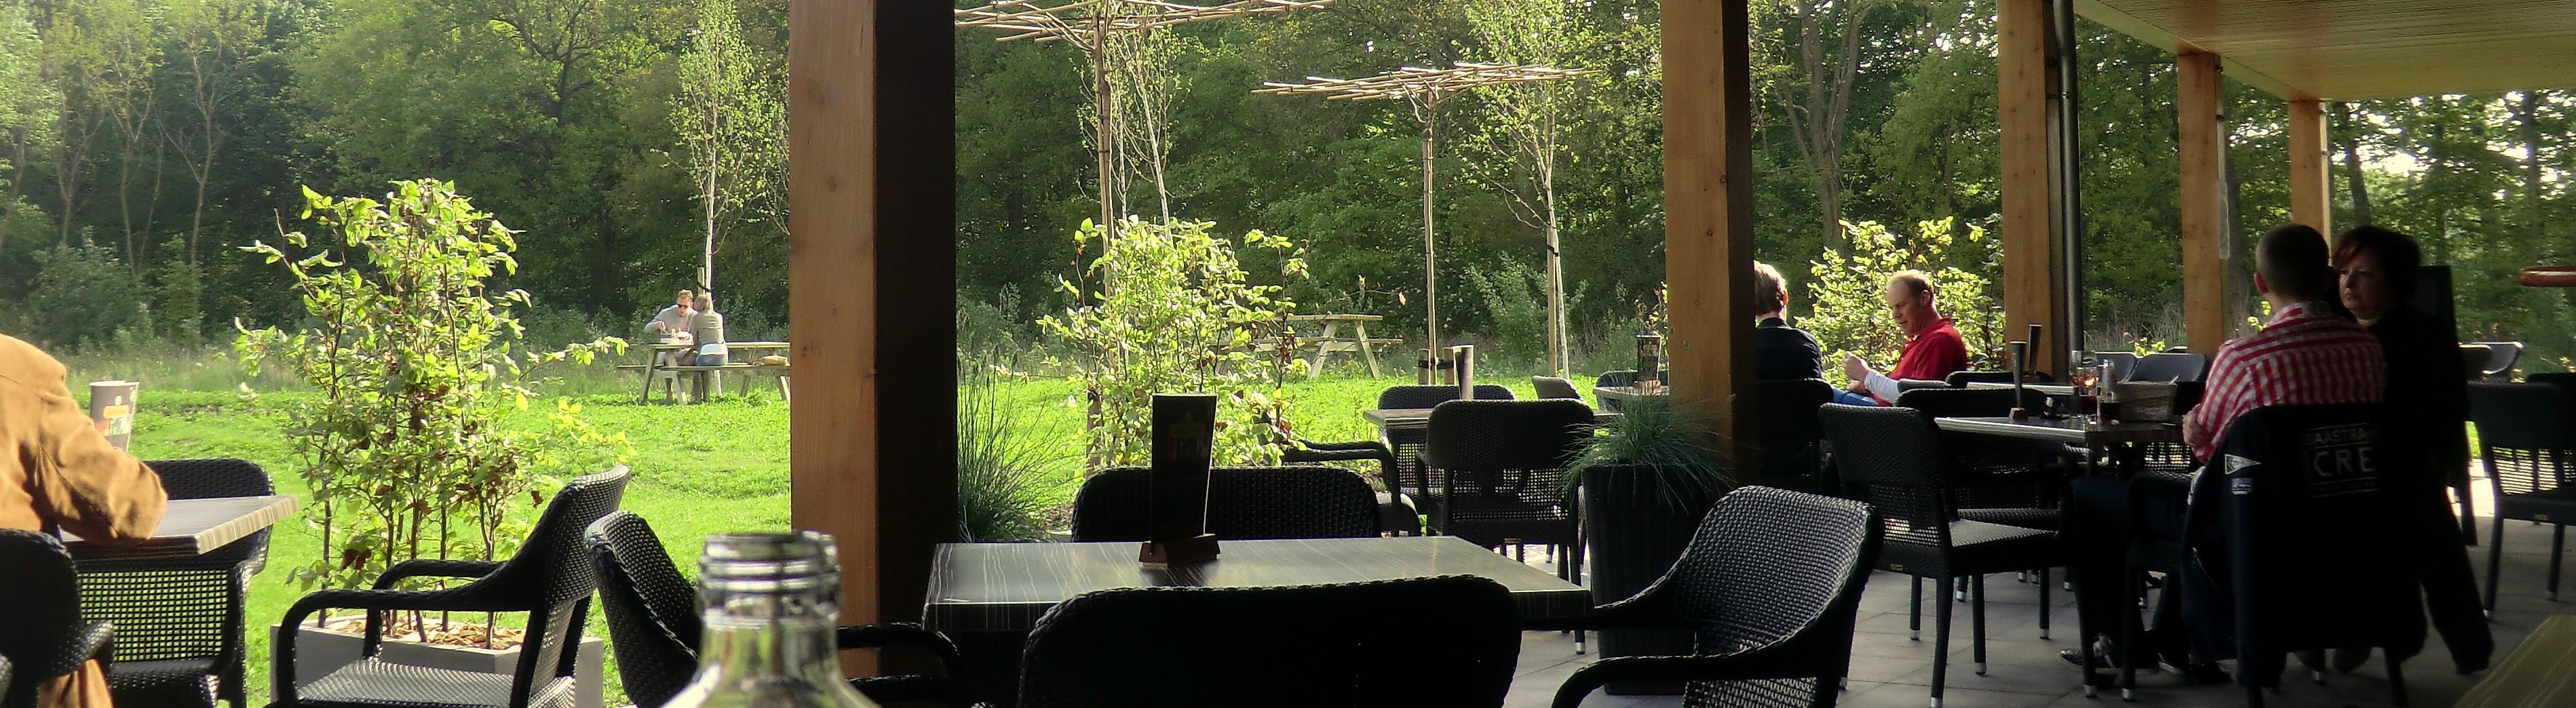 Lodge visdonk openingstijden